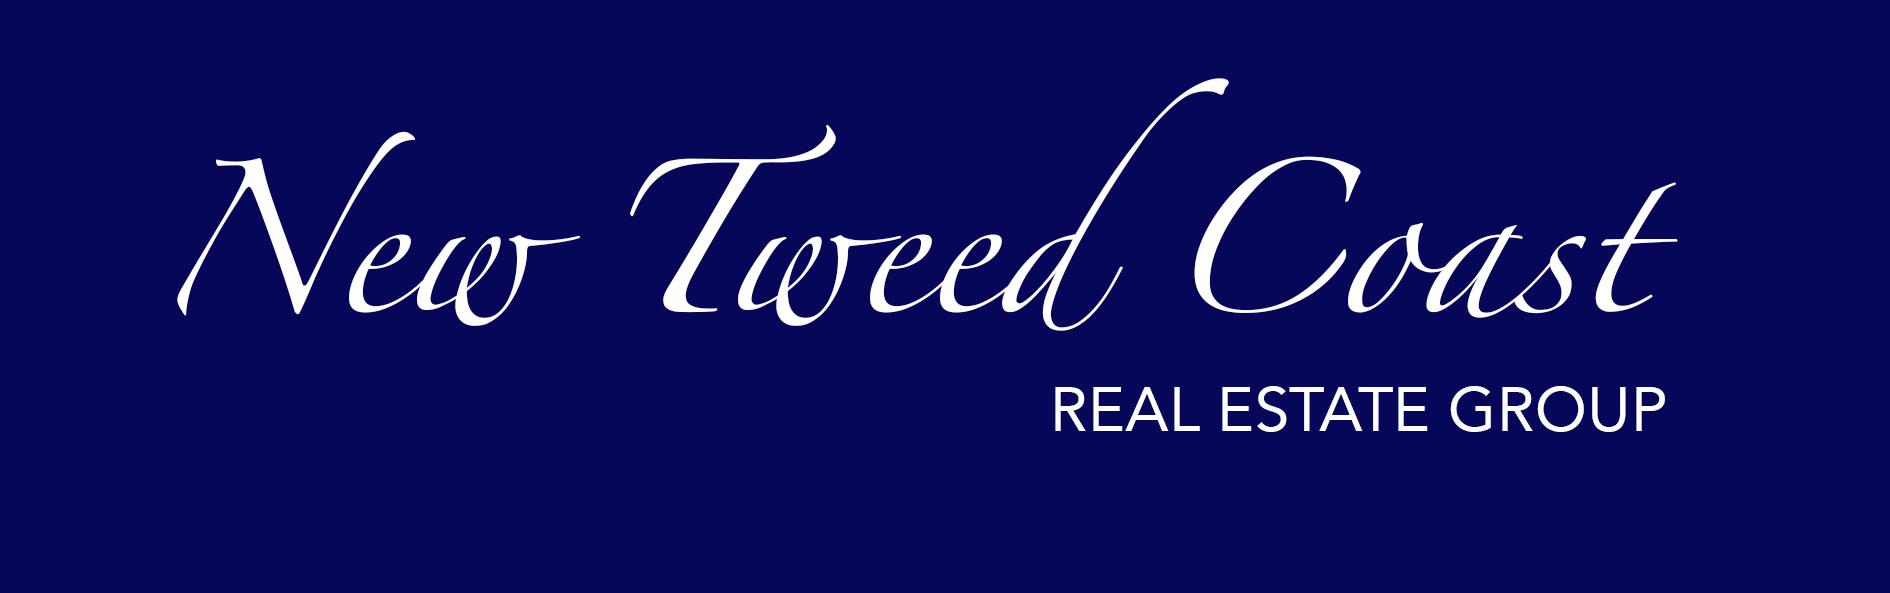 NEW TWEED COAST REAL ESTATE GROUP, Kingscliff, 2487